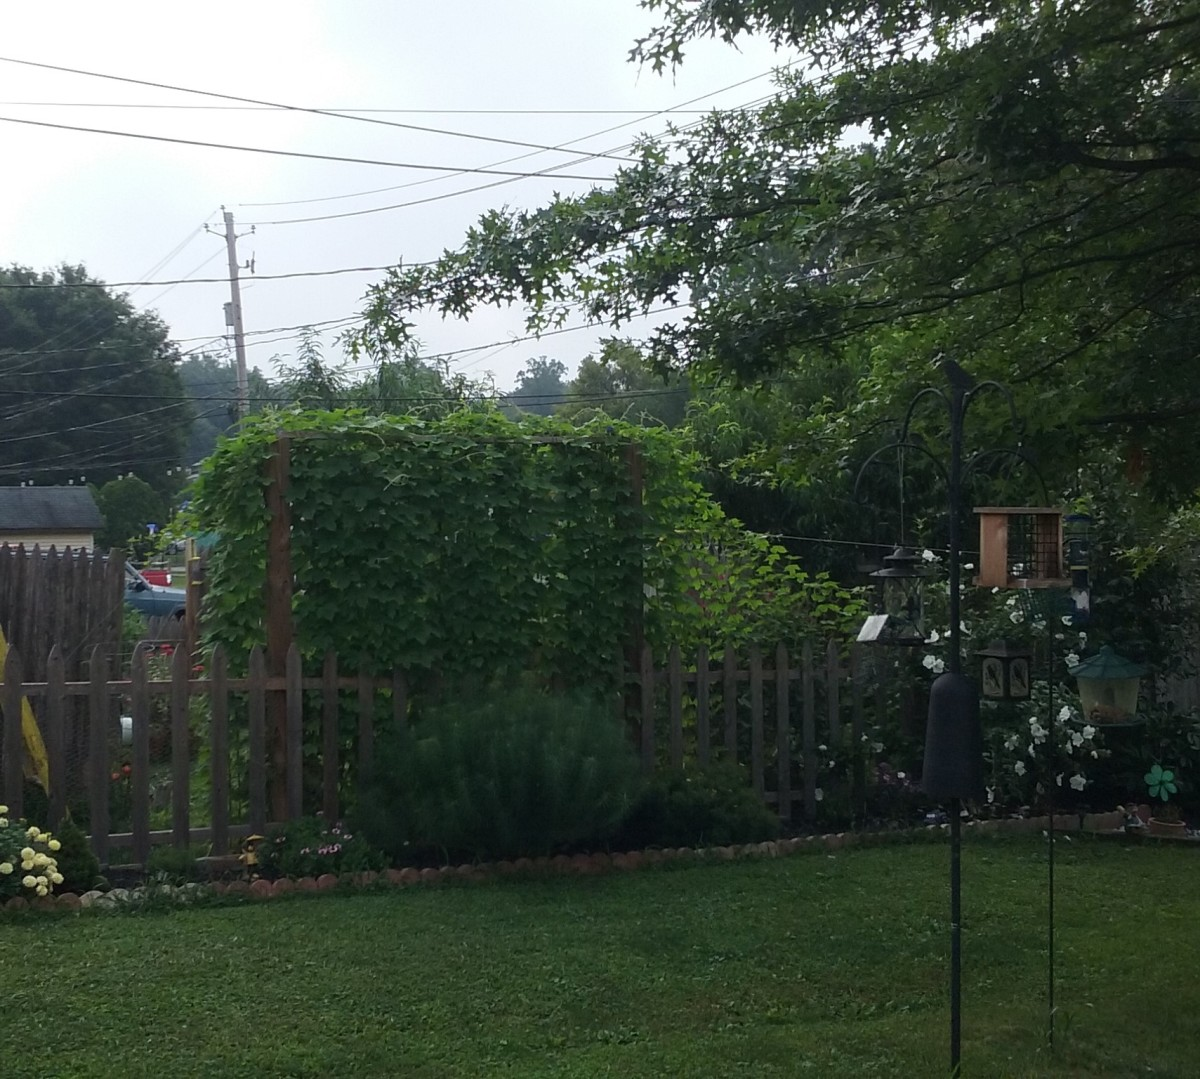 Ah, feel the peace of green leaves blocking neighbors' eyes.